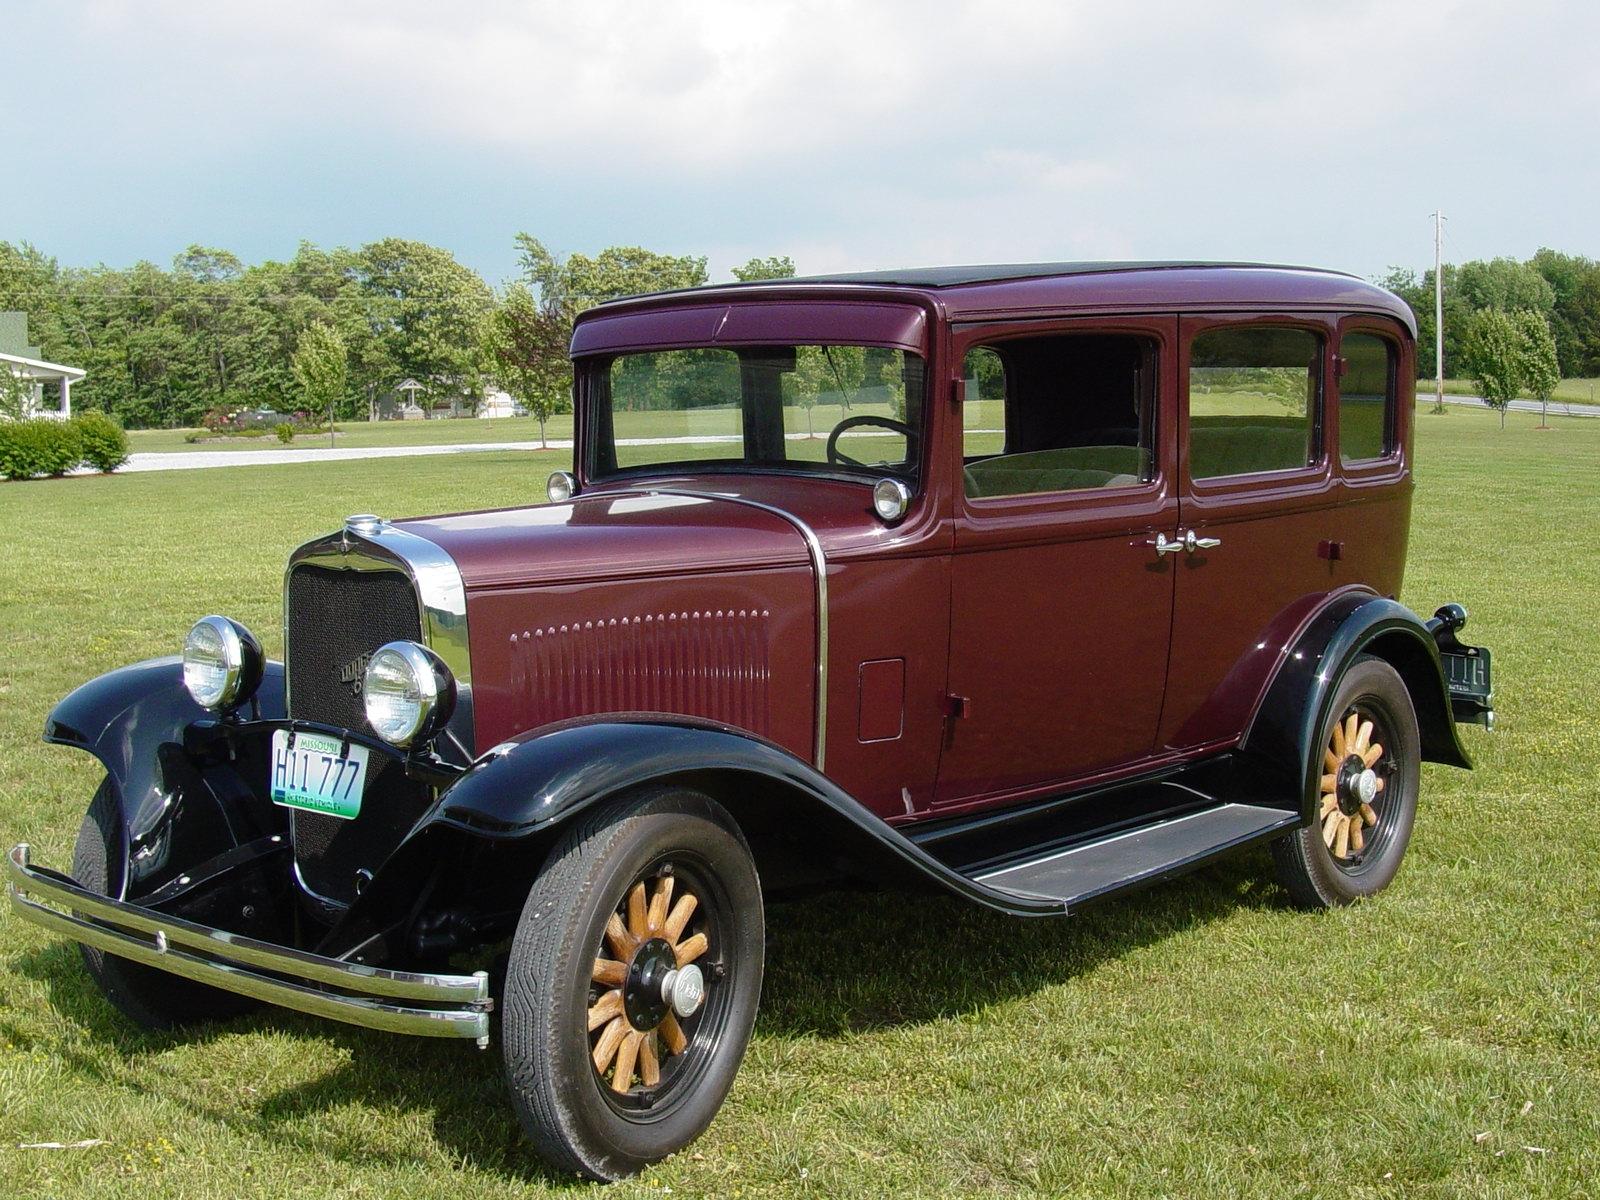 High Resolution Wallpaper | 1930 Dodge Dc8 1600x1200 px